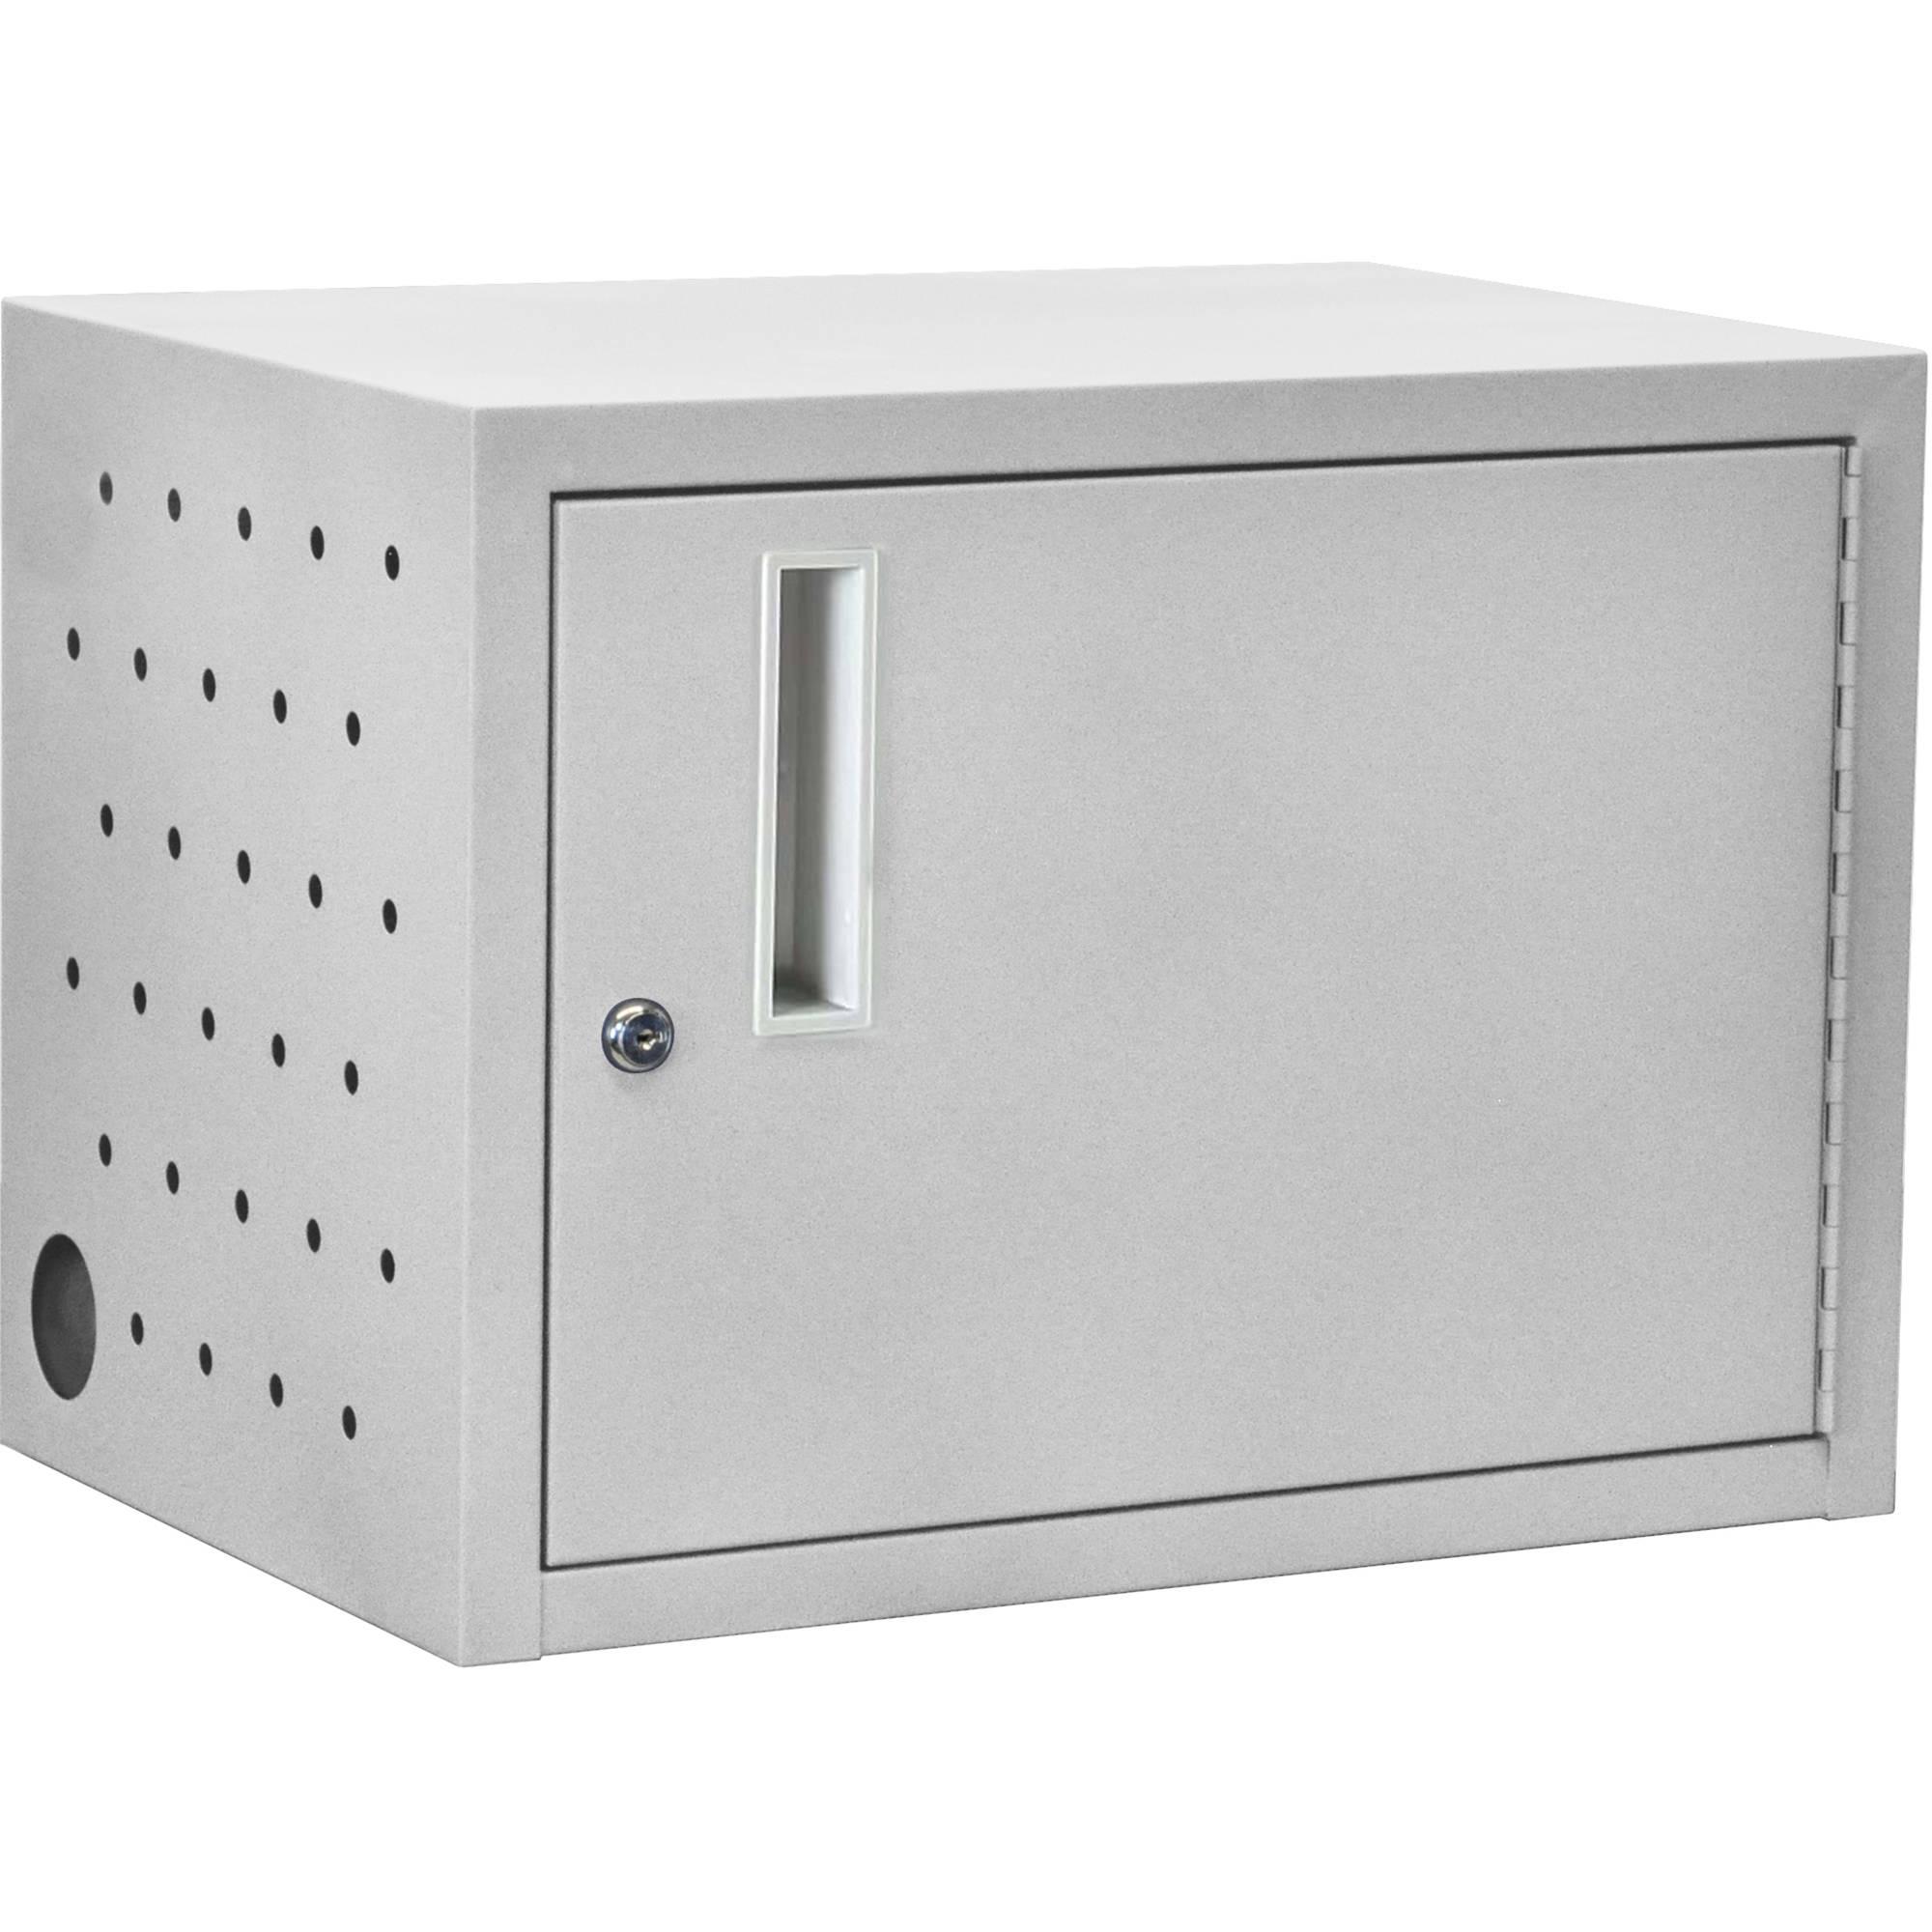 Luxor 12 Tablet Wall Desk Charging Box Gray